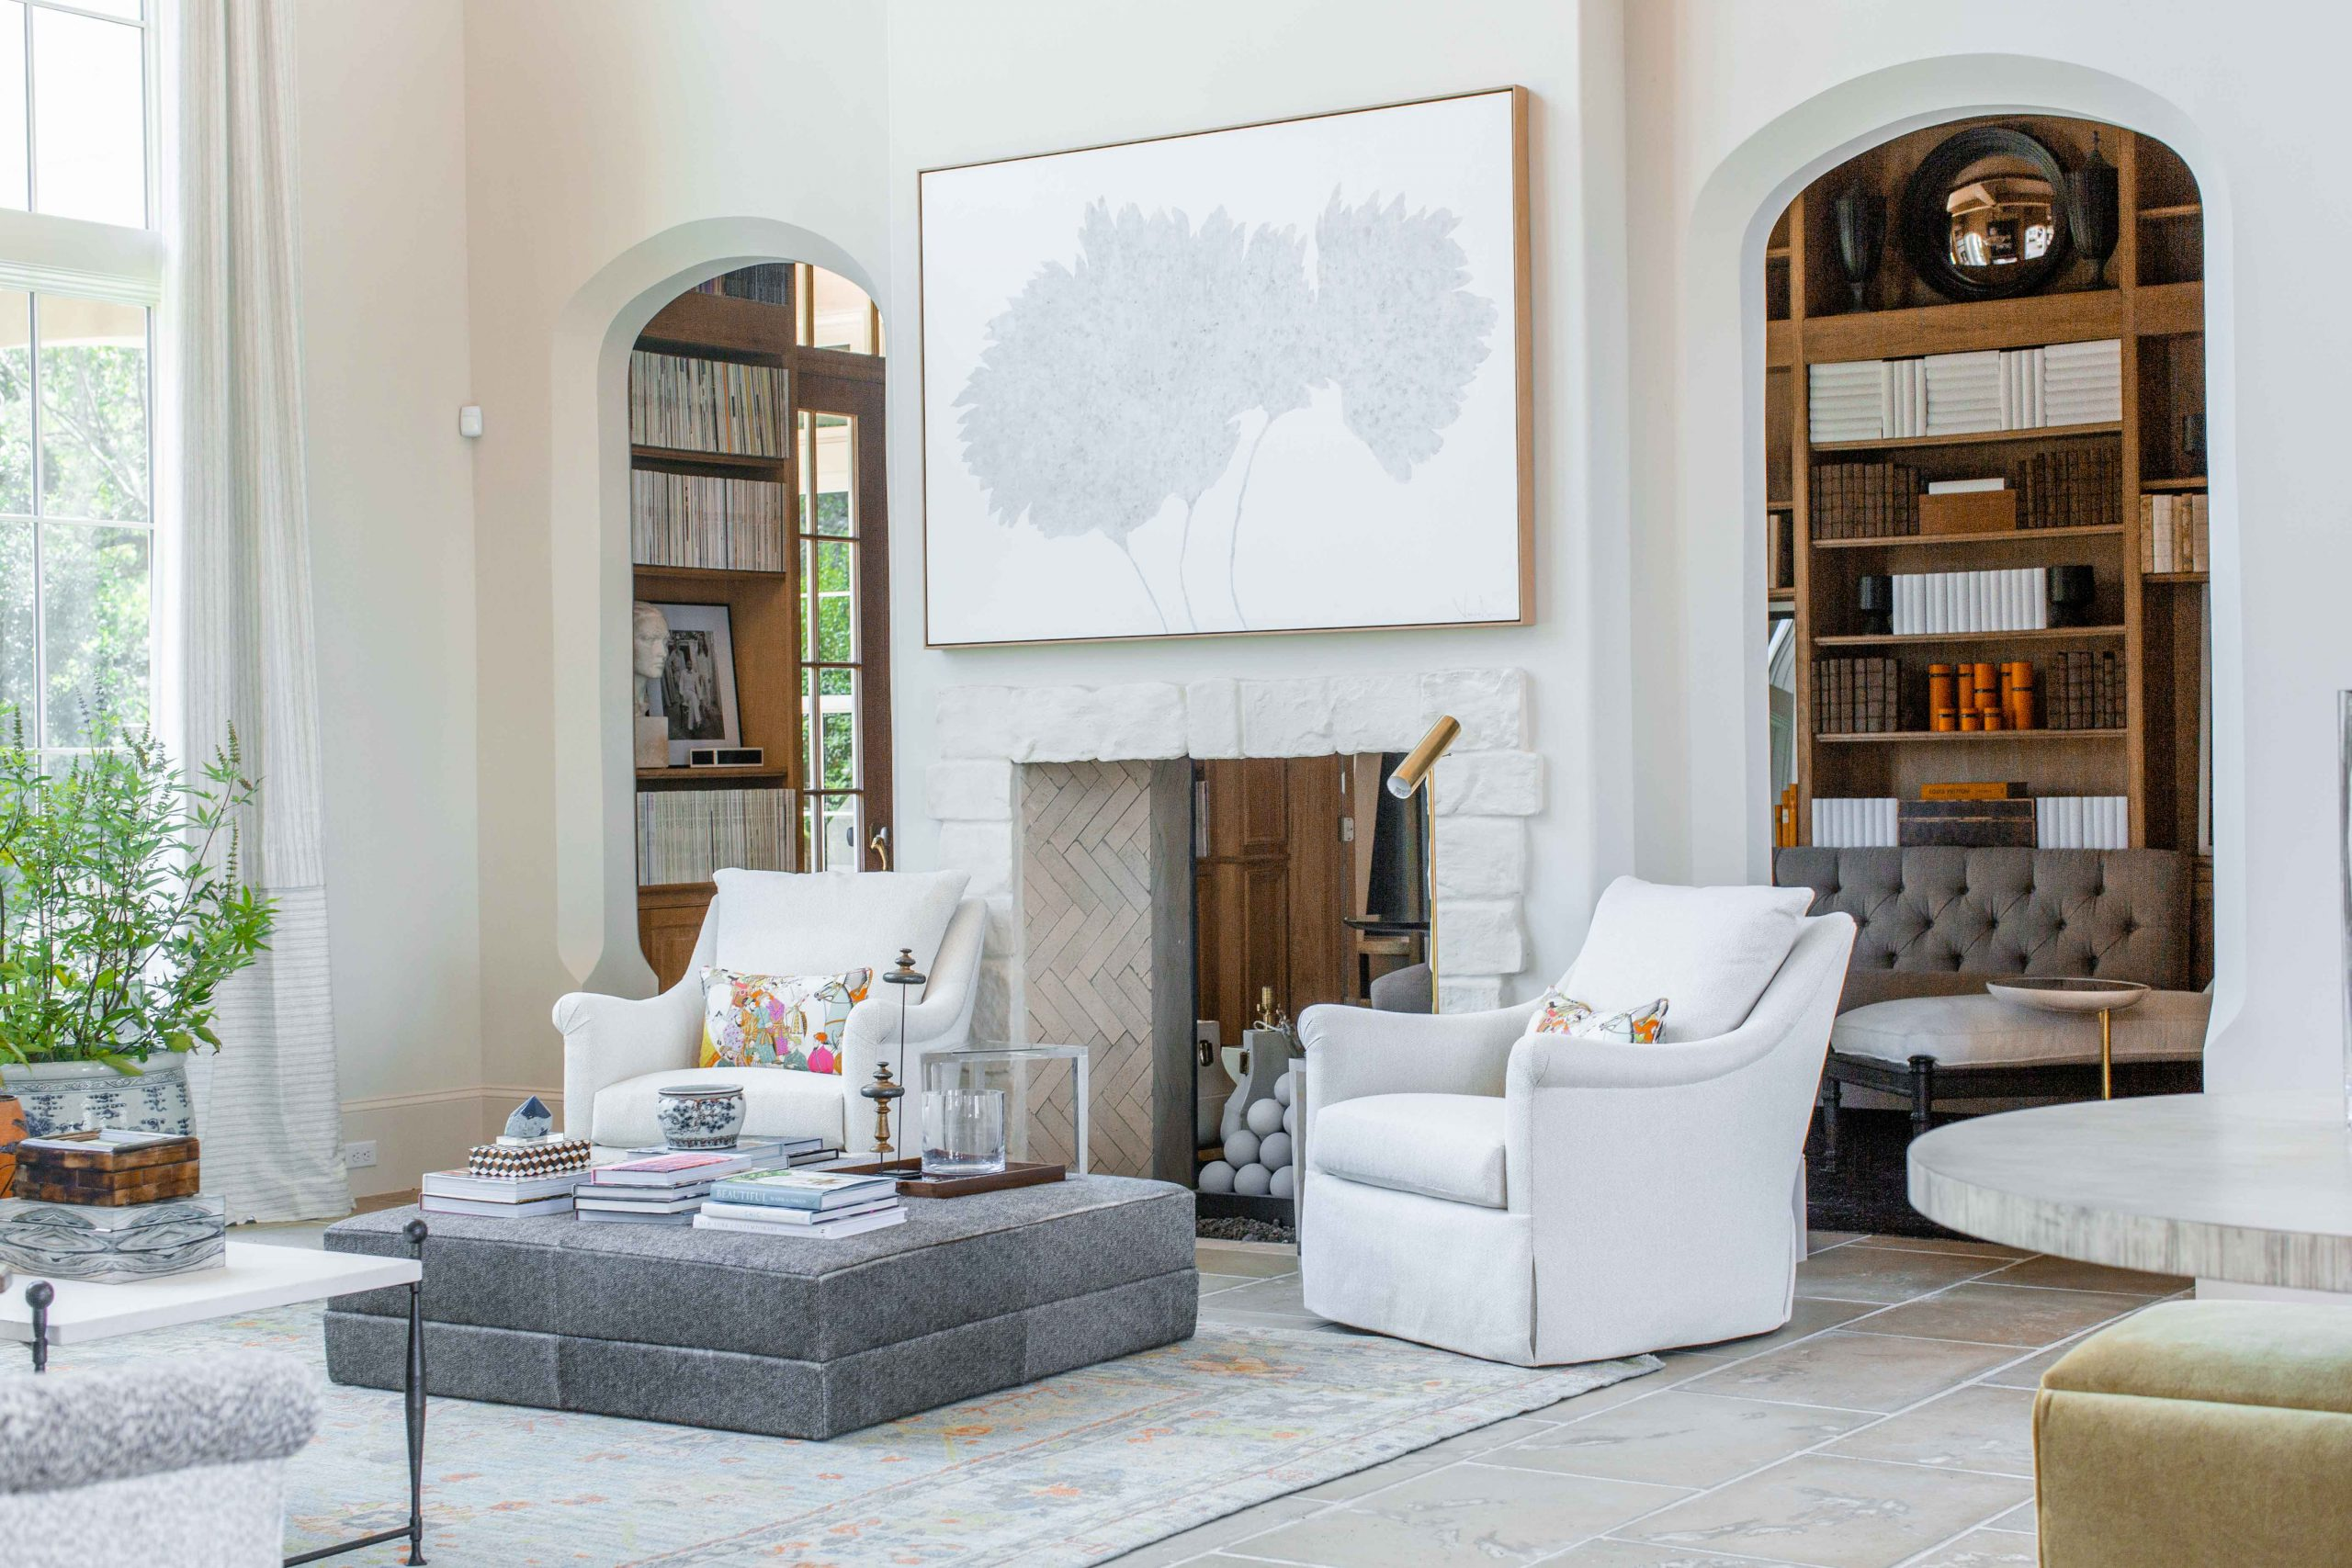 dixon-smith-interiors-baton-rouge-interior-design-custom-ivy-house-show-home-Web-0025